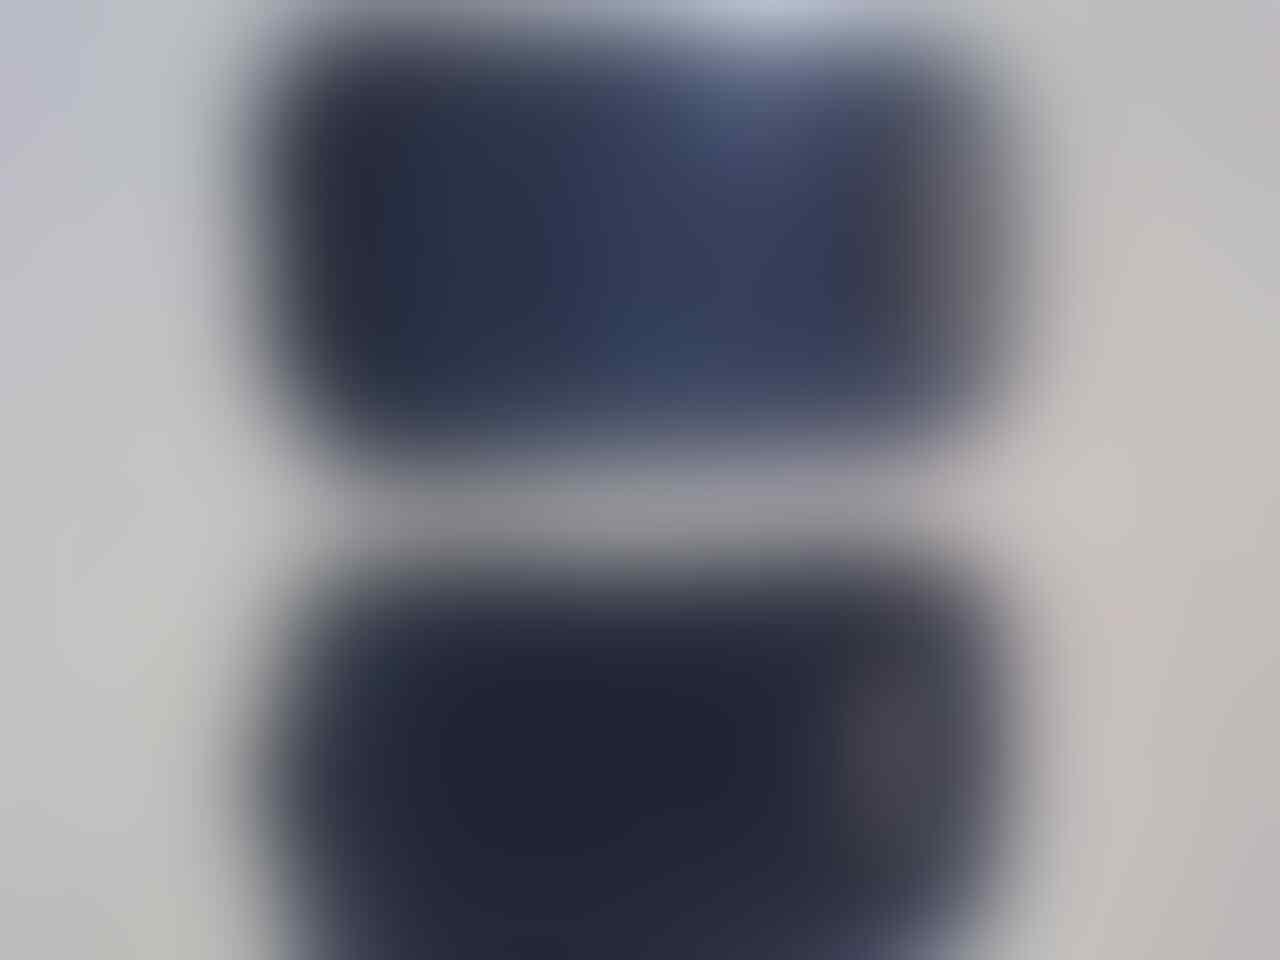 BLACKBERRY BELAGIO 9790 GARANSI TAM